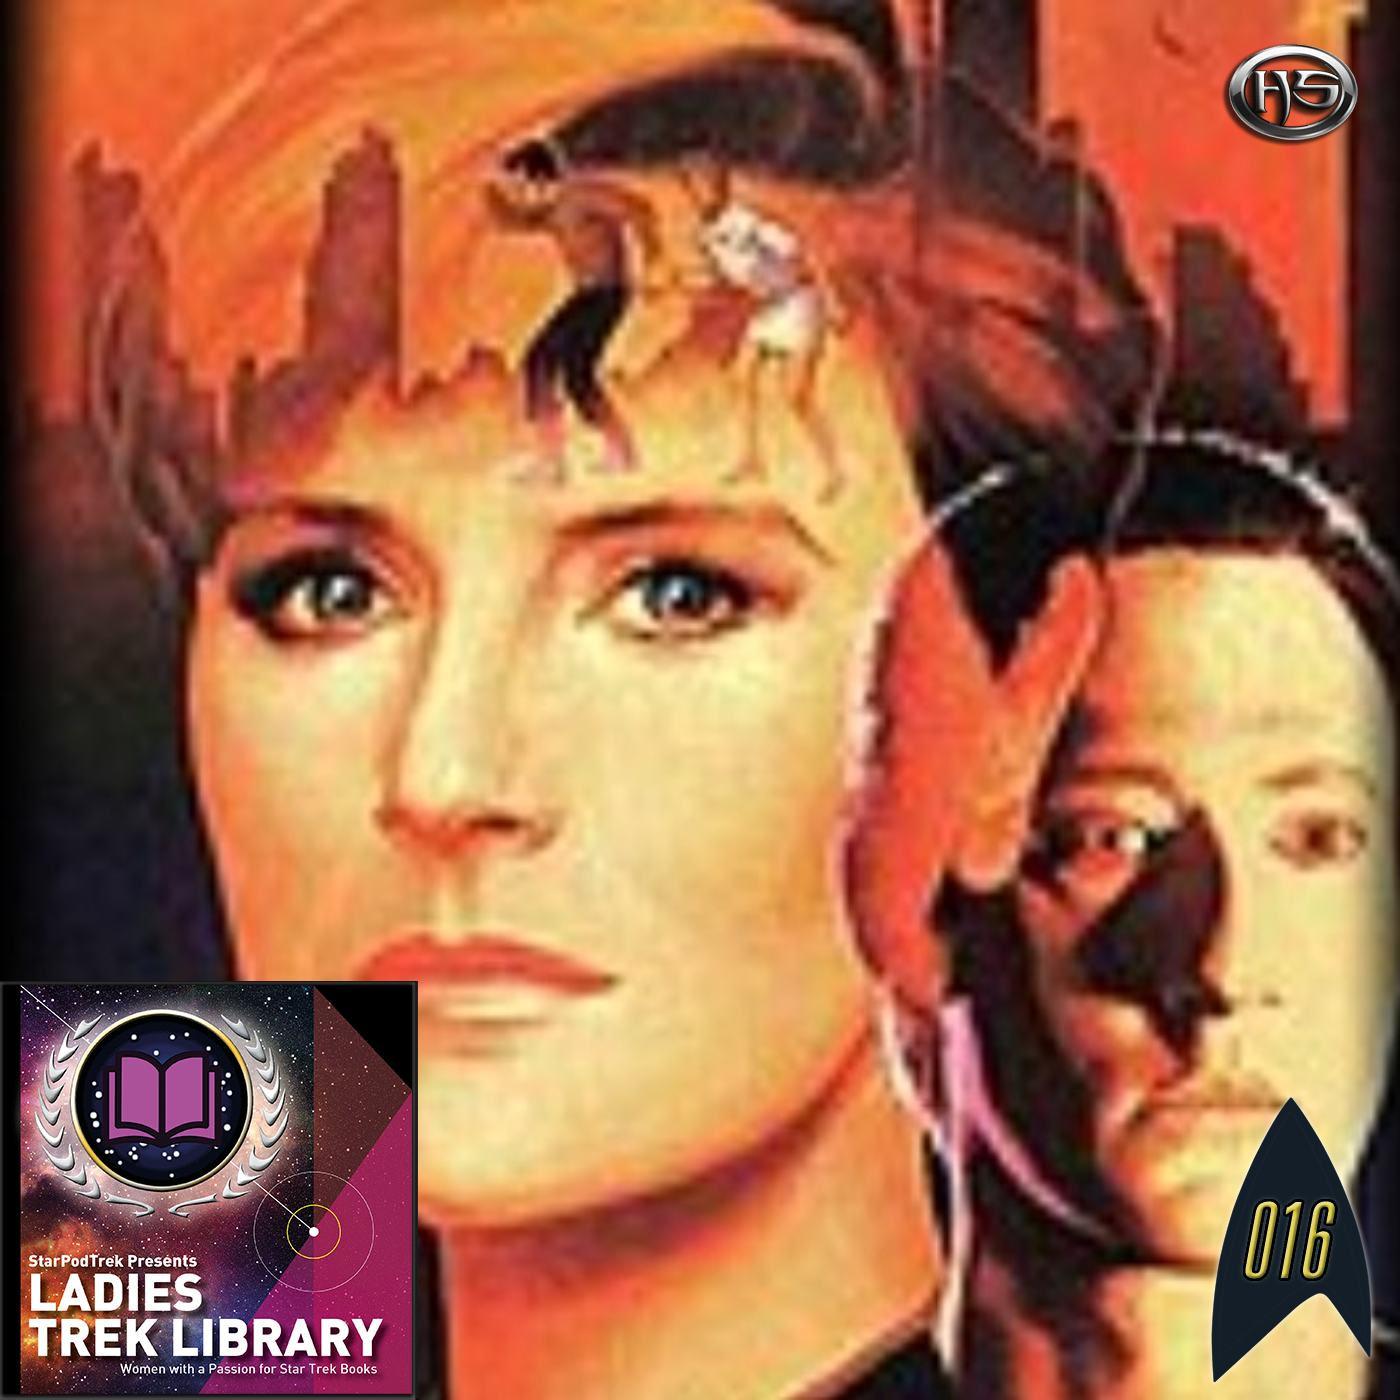 Ladies Trek Library Episode 16